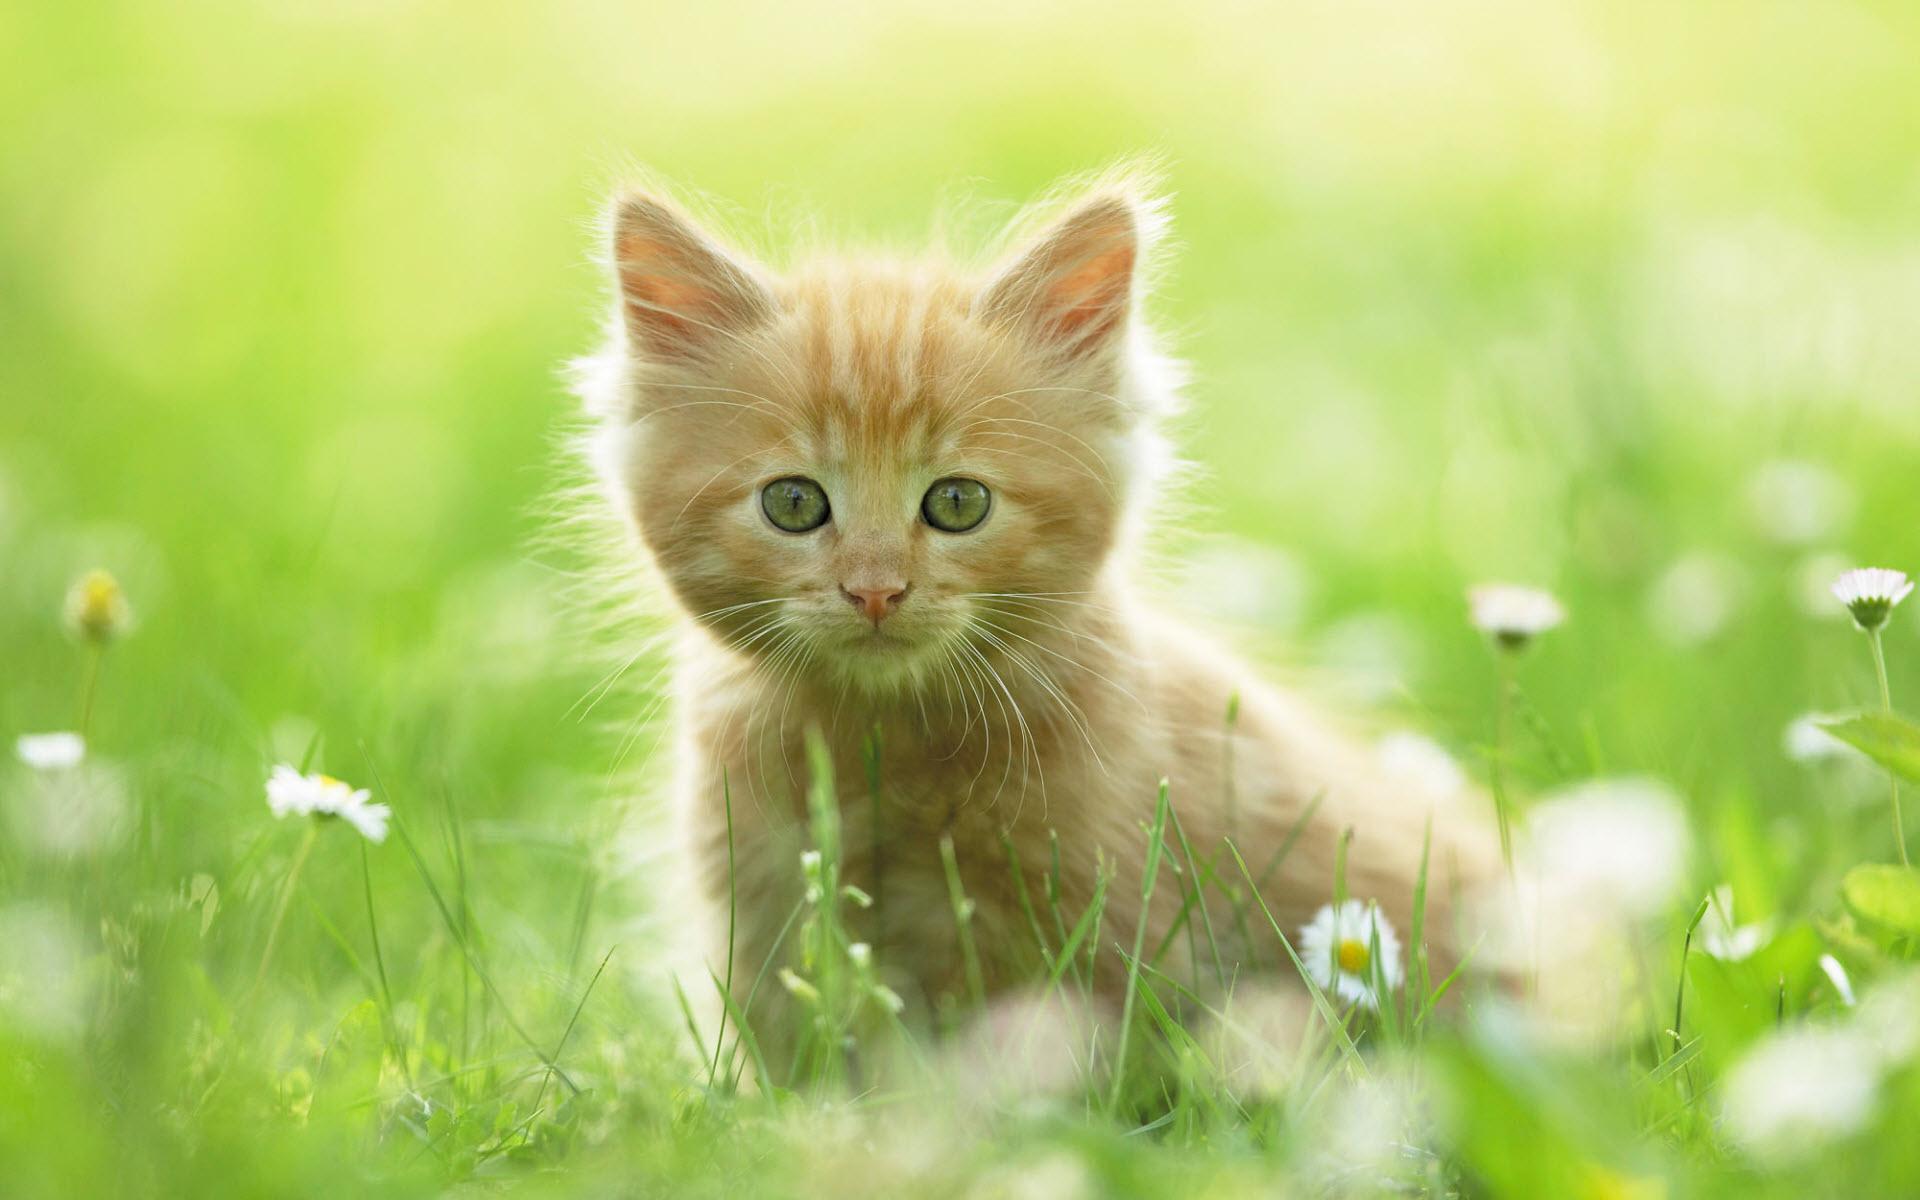 Curious Cute Kittens HD Wallpapers - Design Hey | Design Hey ...